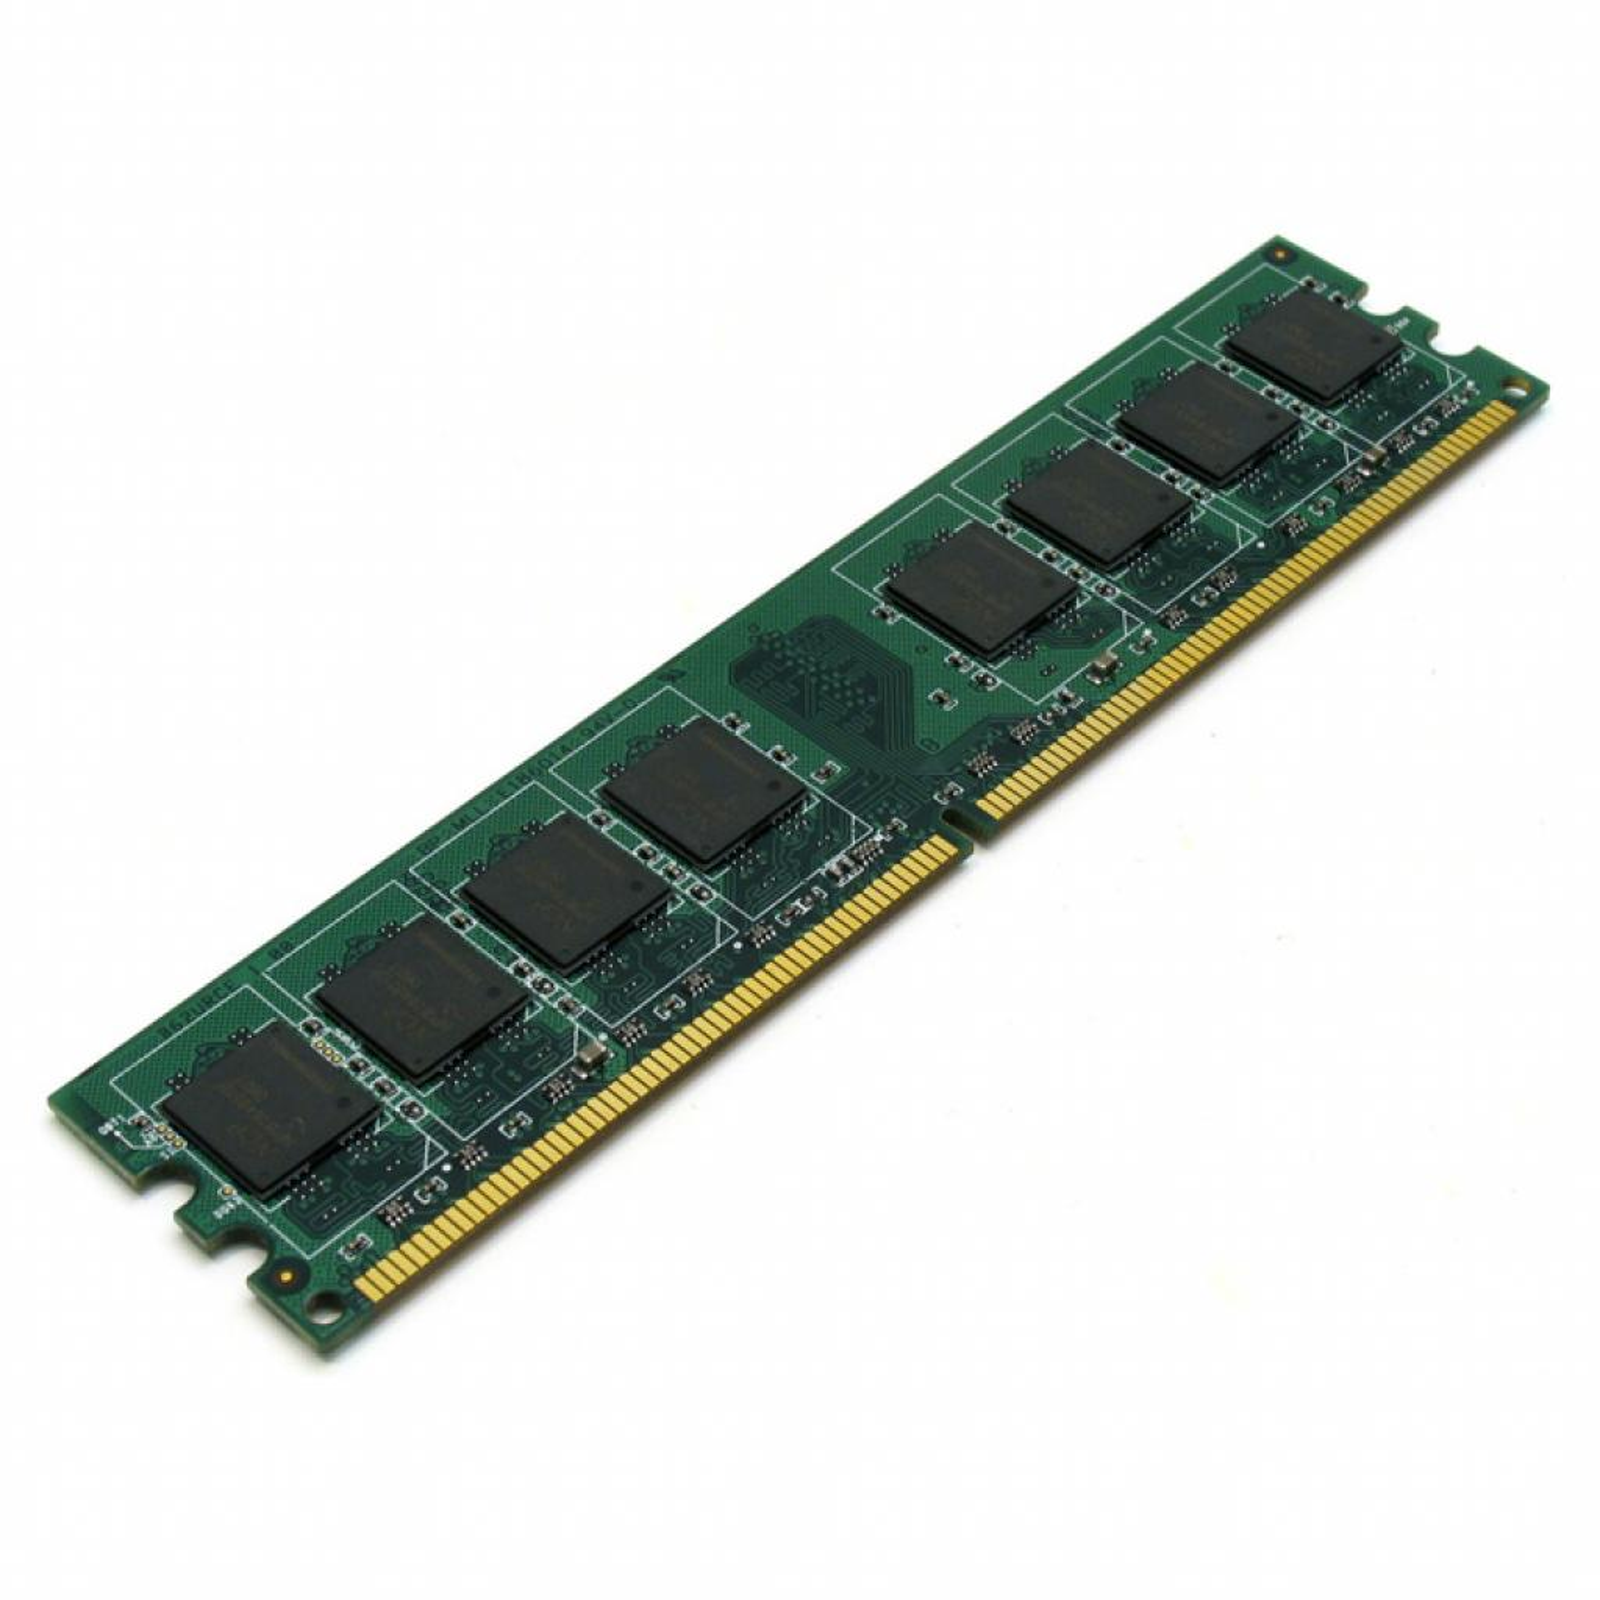 Модуль памяти для компьютера DDR3 4GB 1600 MHz Hynix (HMT451U6MFR8C-PBN0)